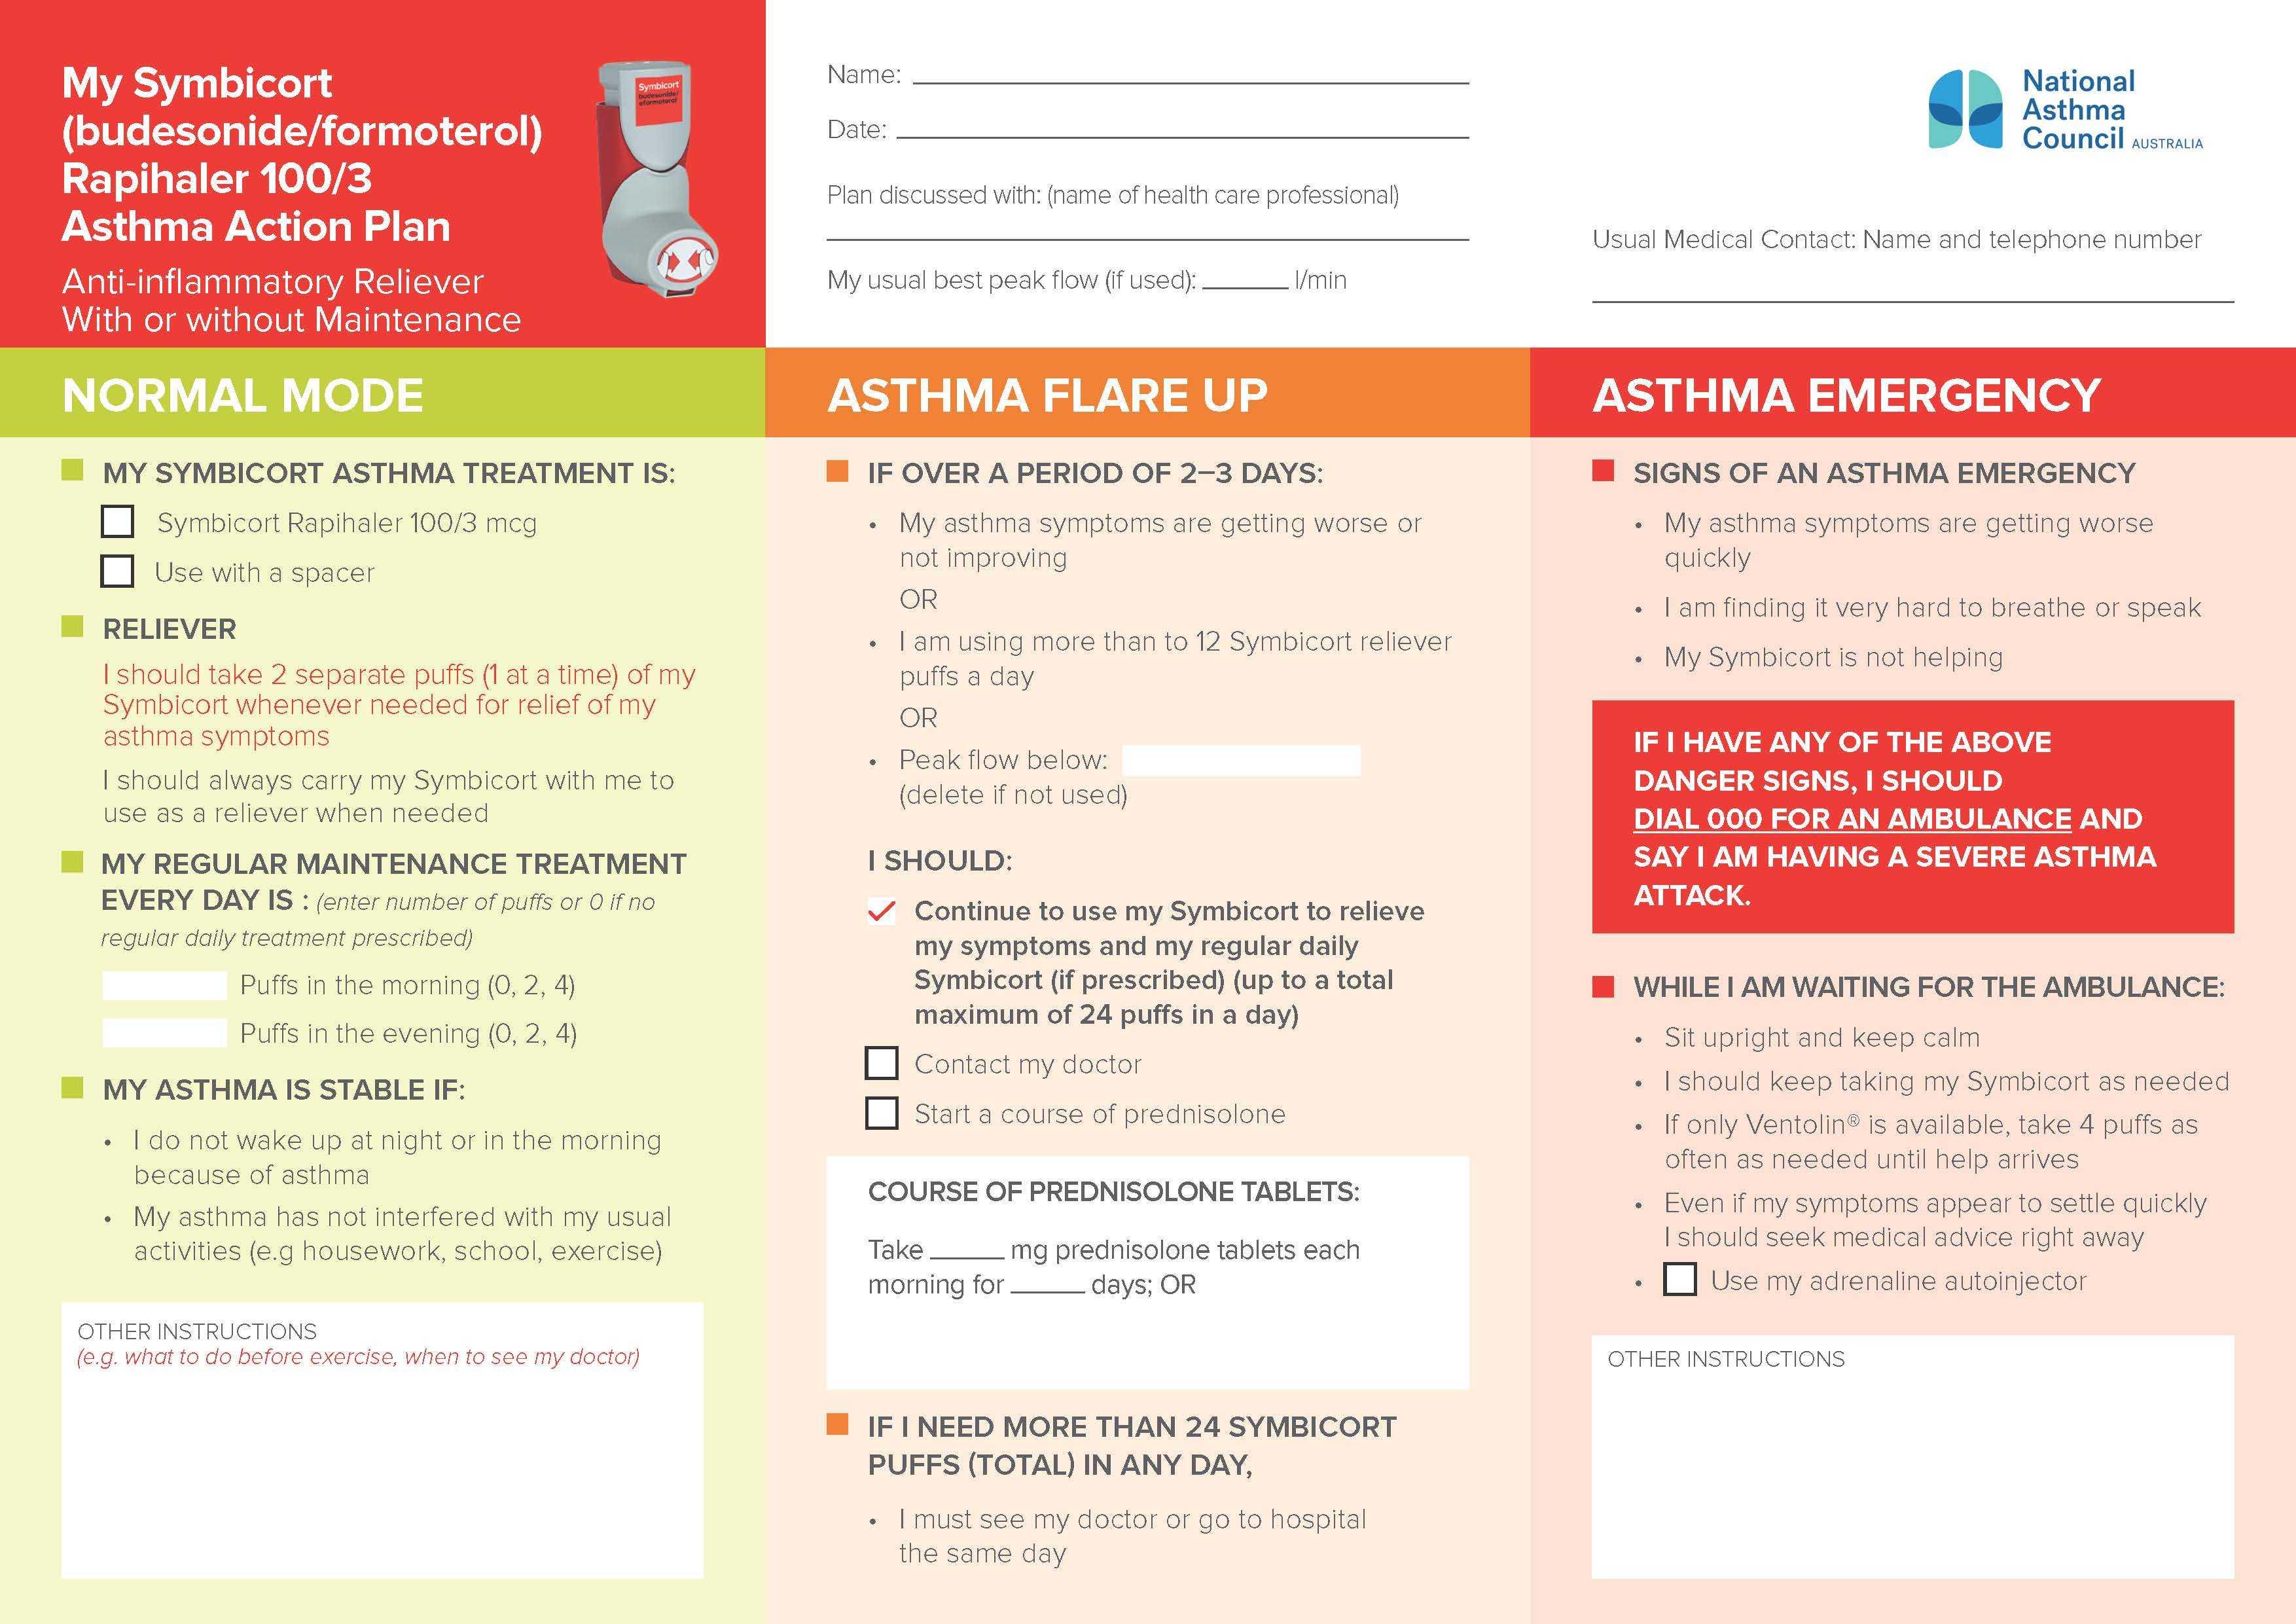 Symbicort_Asthma_Action_Plan_Rapihaler_01.06.2020_Page_1.jpg#asset:2198